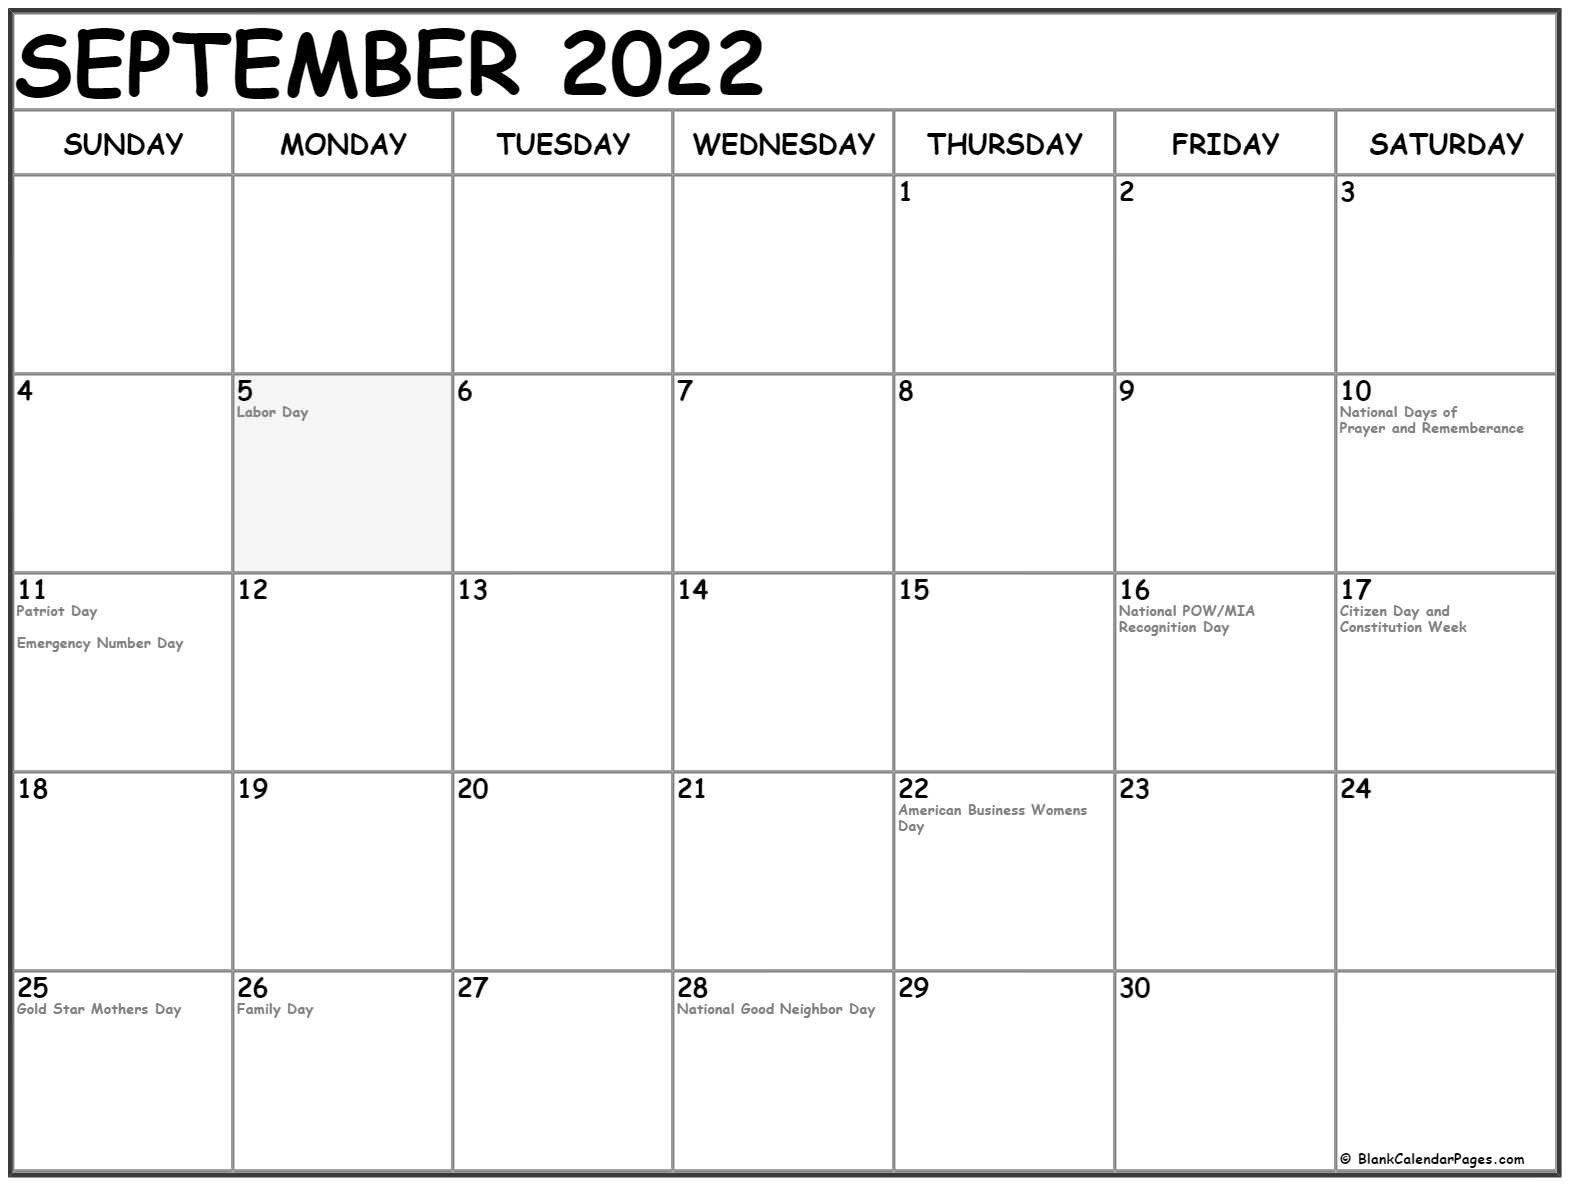 September 2022 With Holidays Calendar within Print Month Calendar September 2022 Image